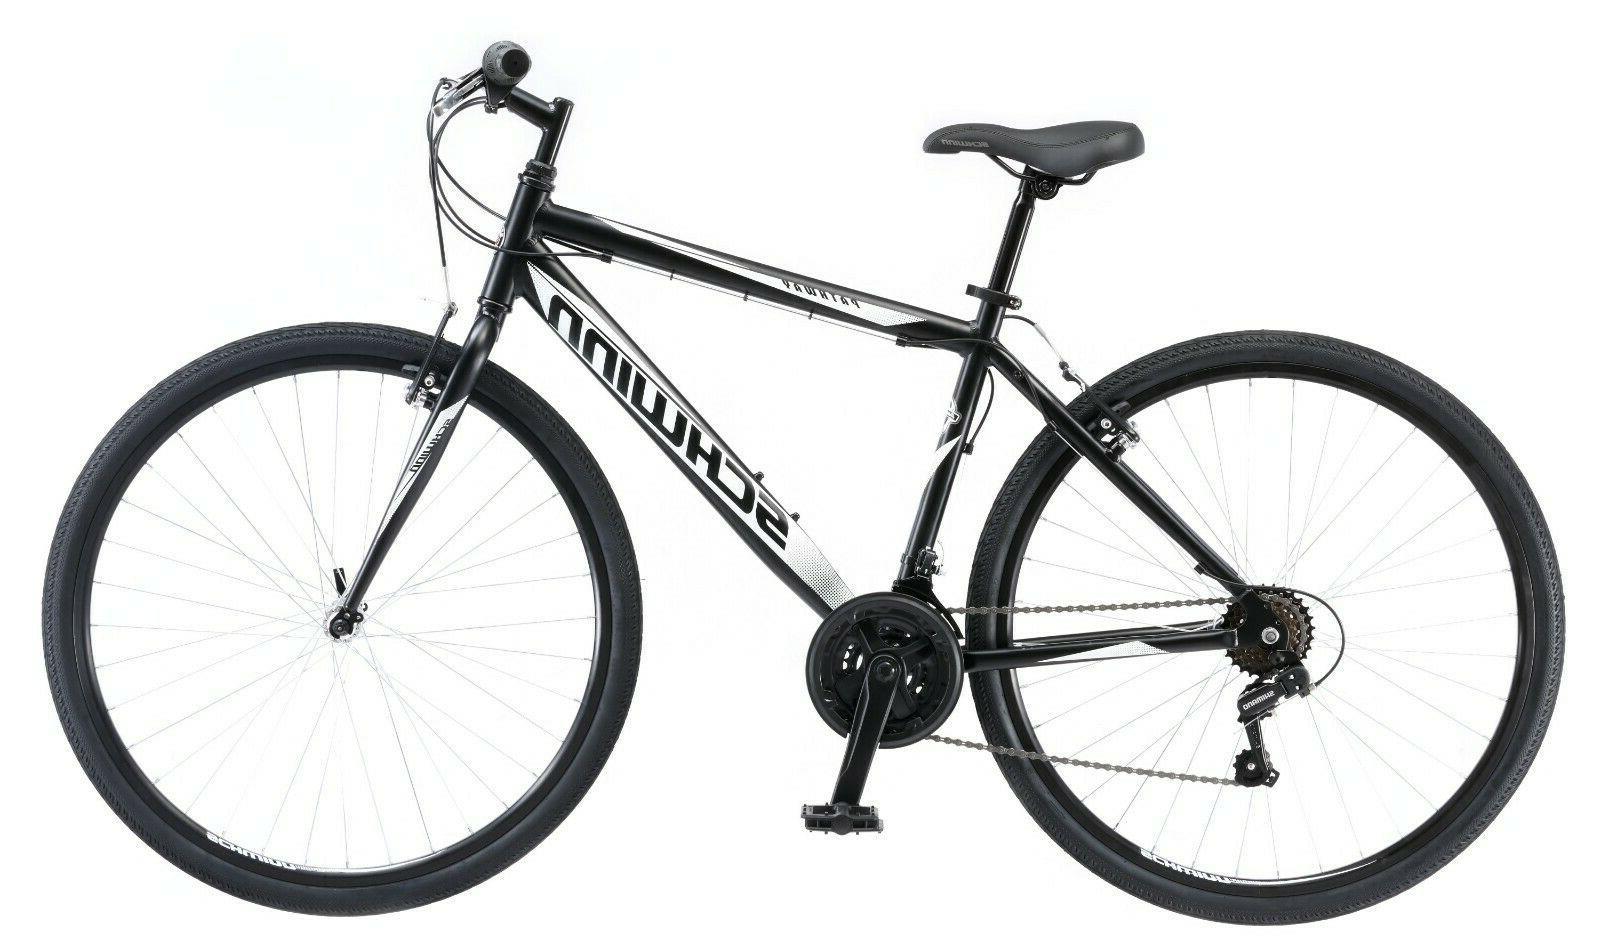 Schwinn Bike 18 Speed 700C Road Bicycle